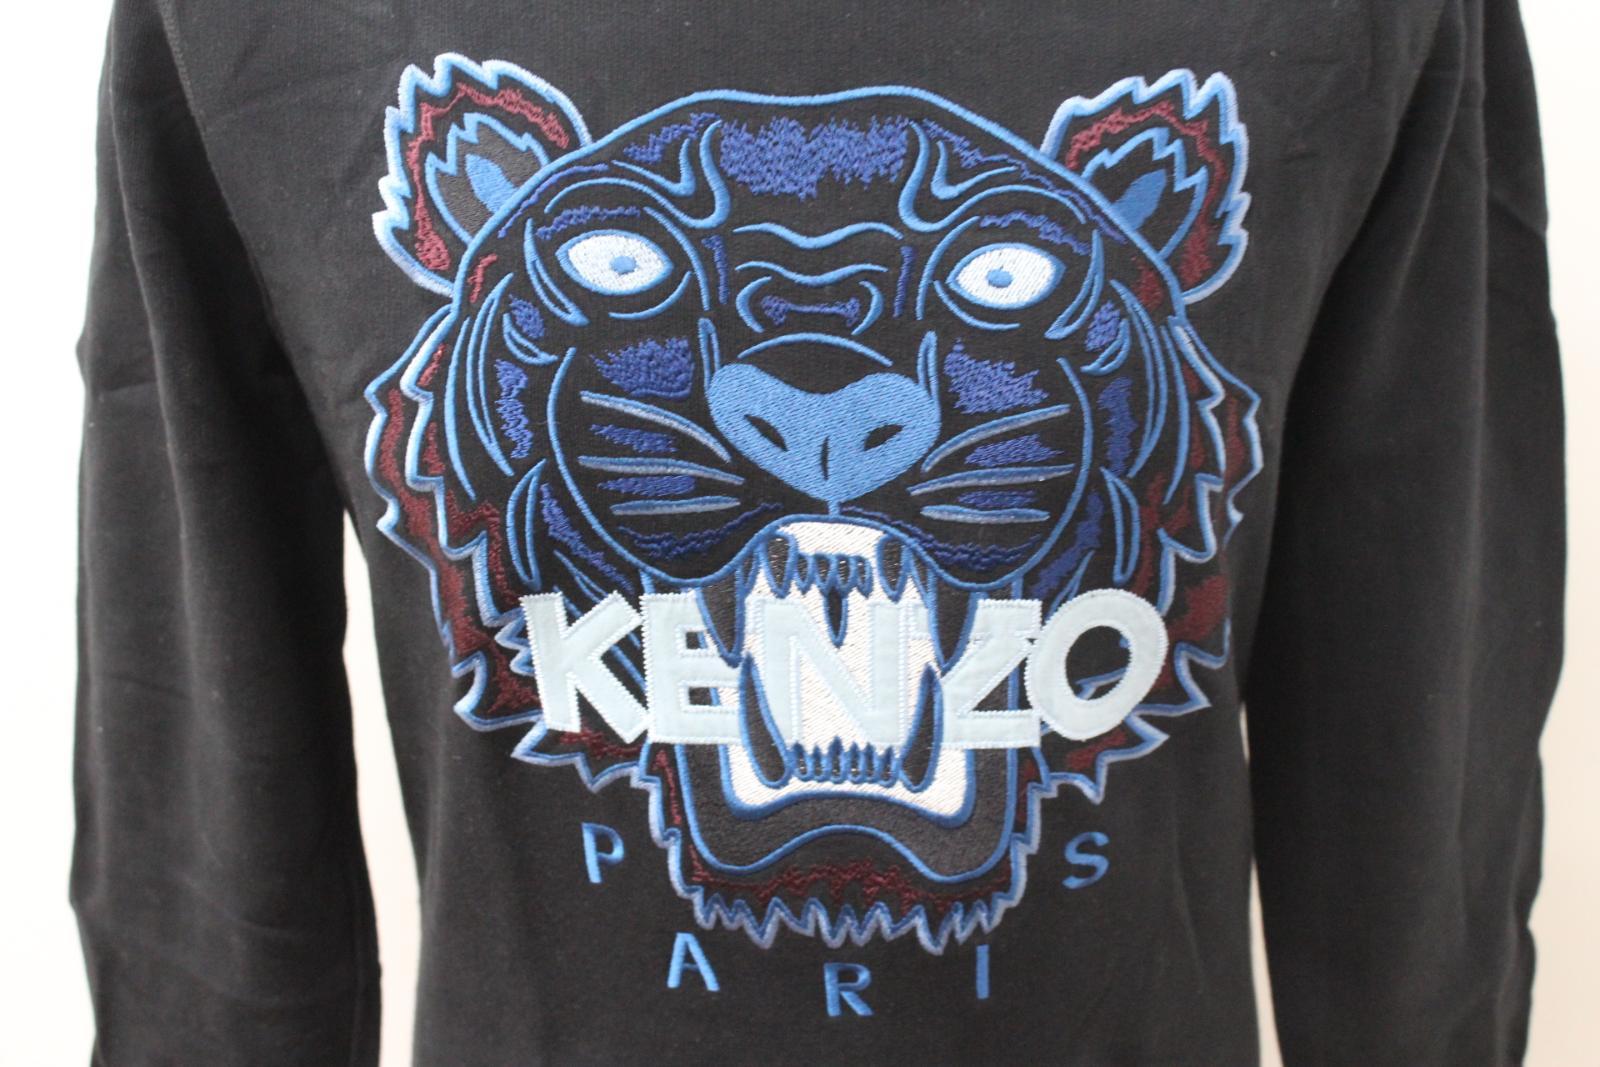 a2dc1a08 KENZO Men's Black & Blue Tiger Head Logo Crew Neck Jumper Sweatshirt Size M  6 6 of 12 ...